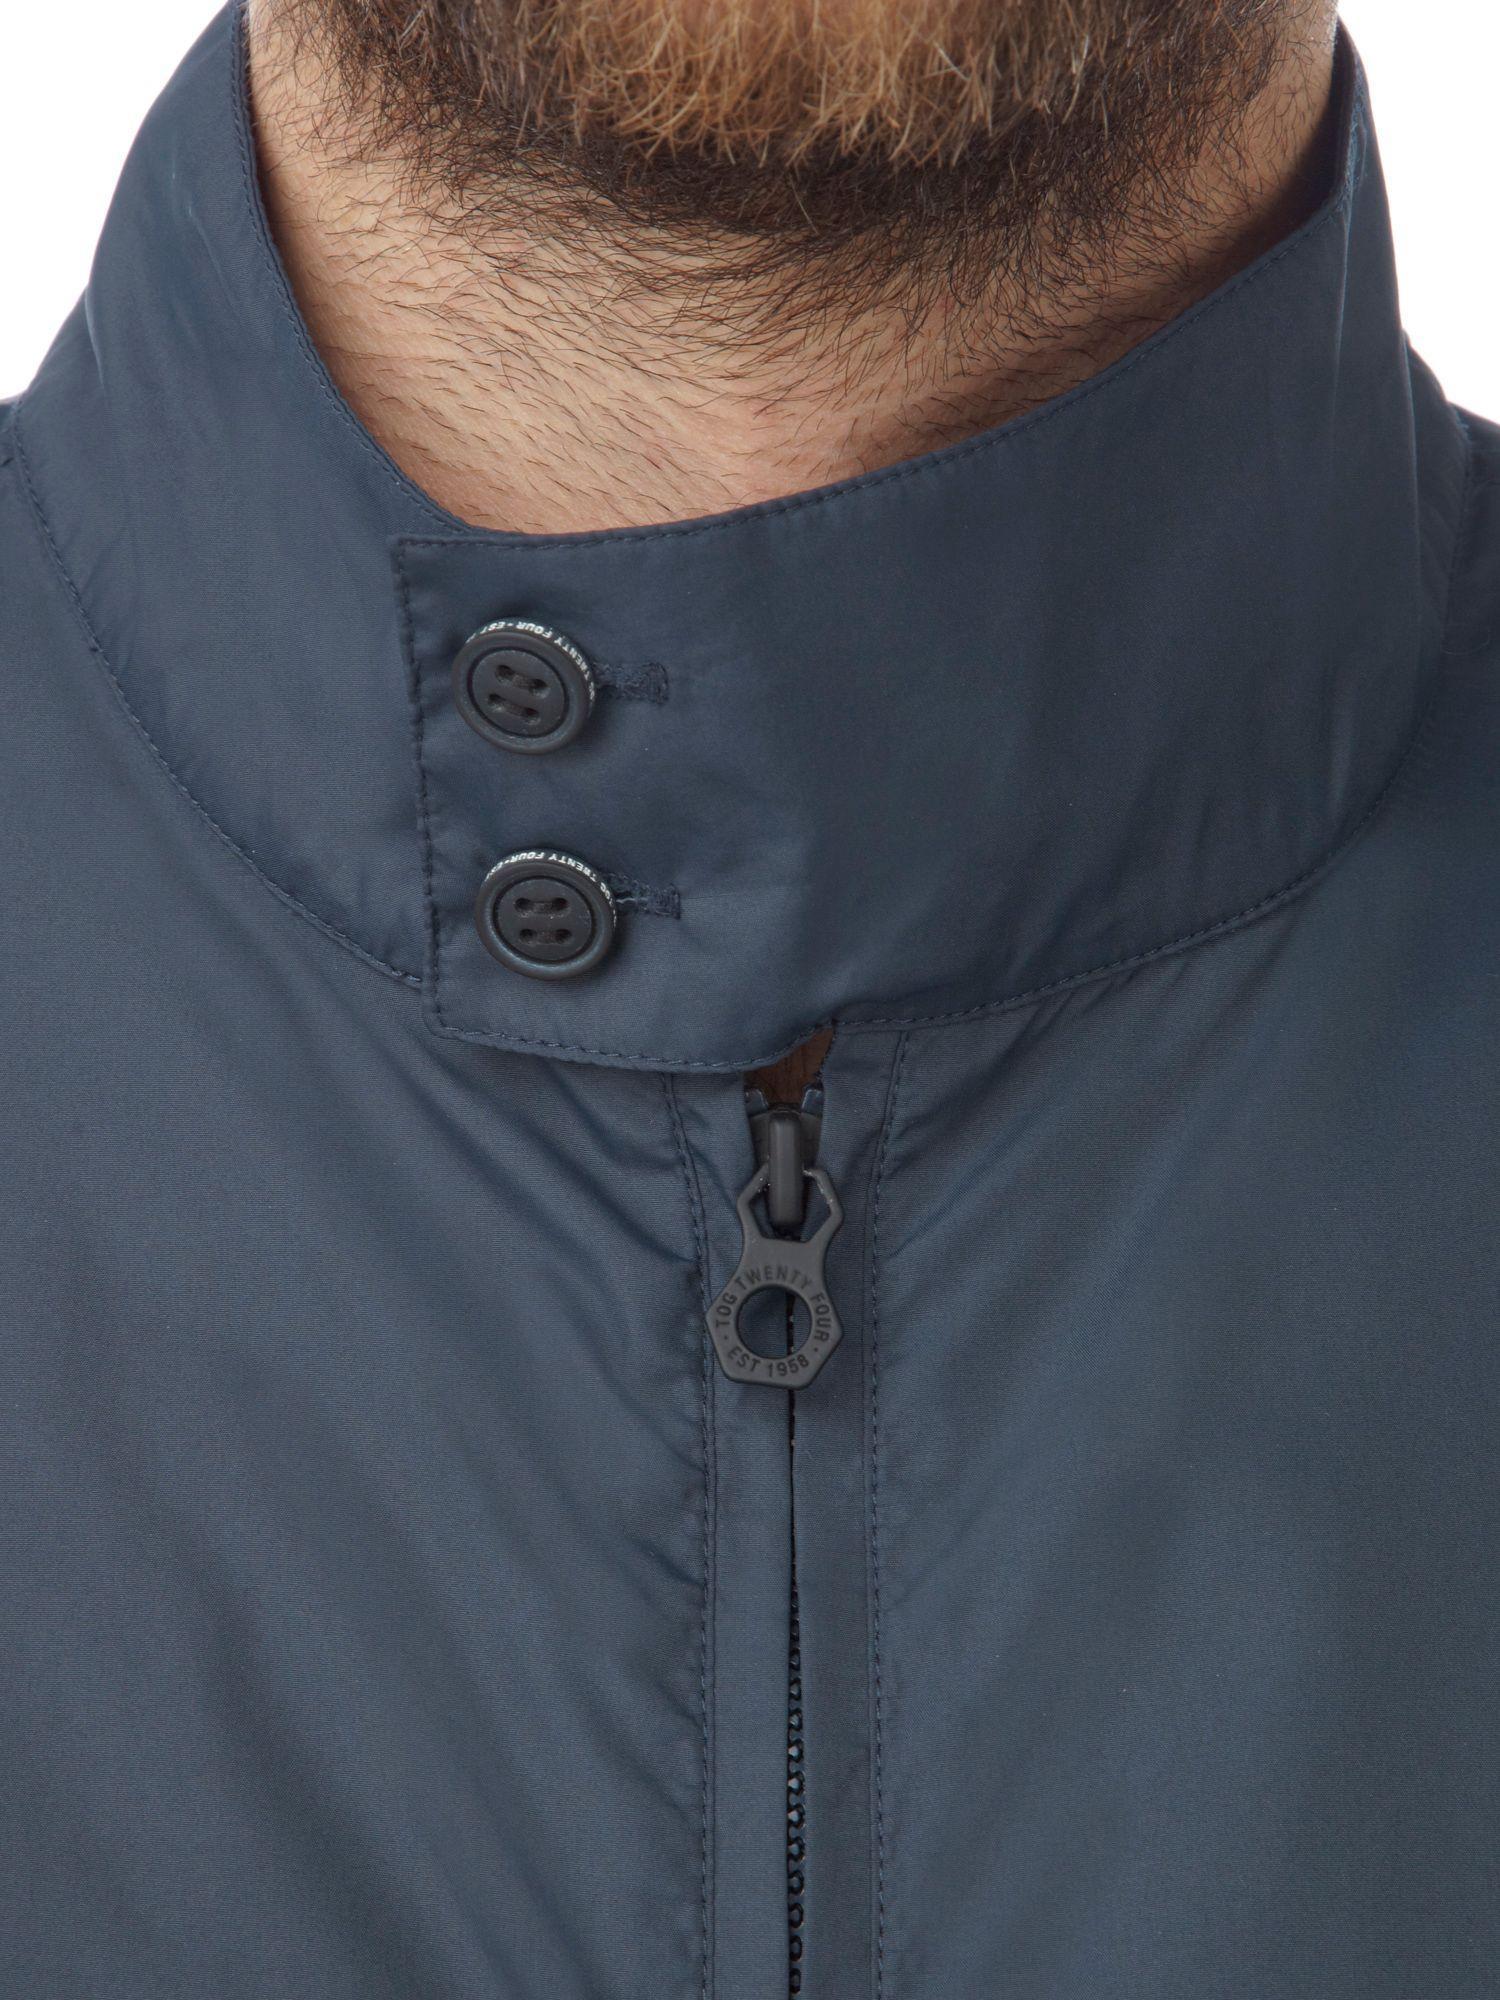 Tog 24 Synthetic Soul Mens Milatex Jacket in Navy (Blue) for Men